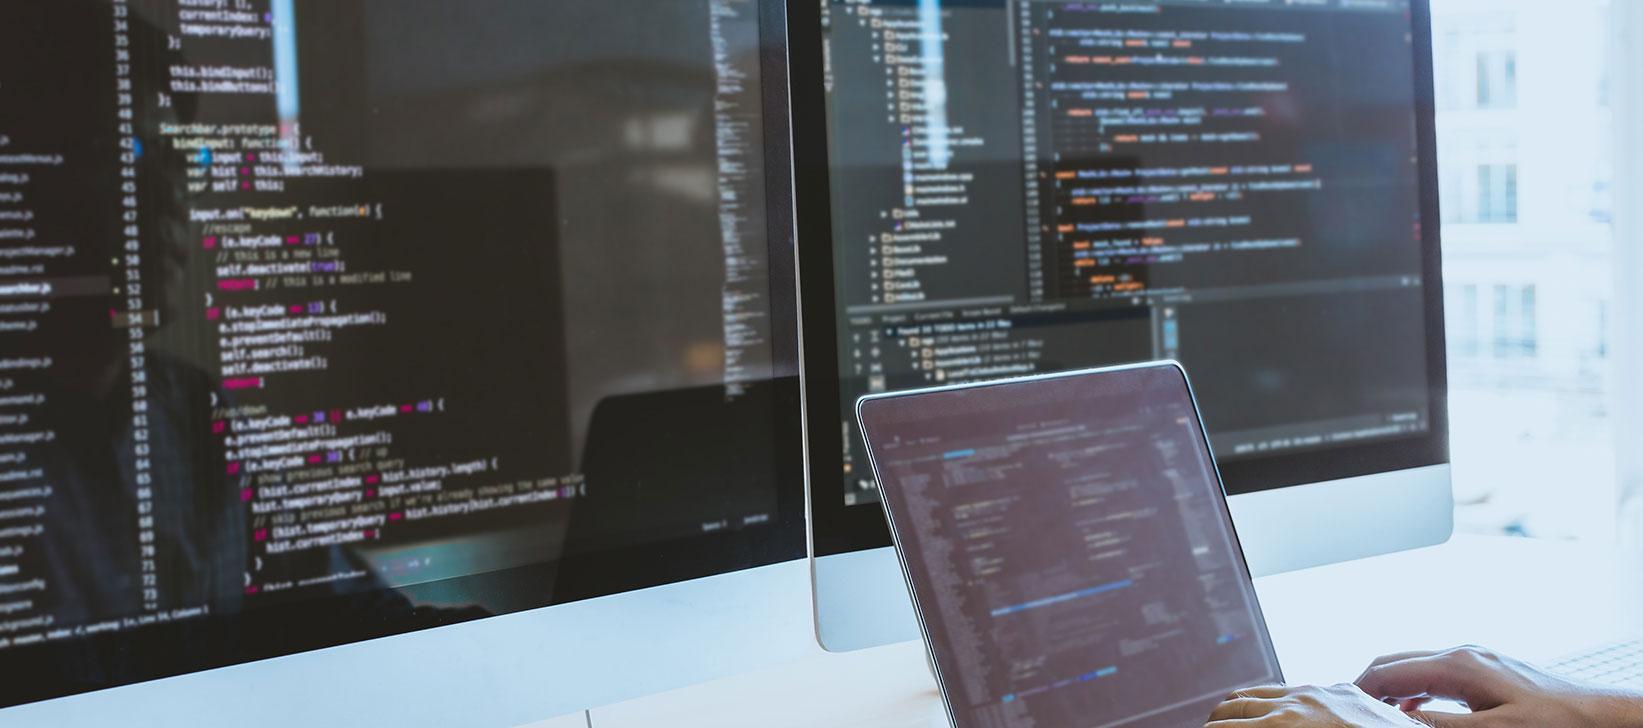 Platform and Application Software